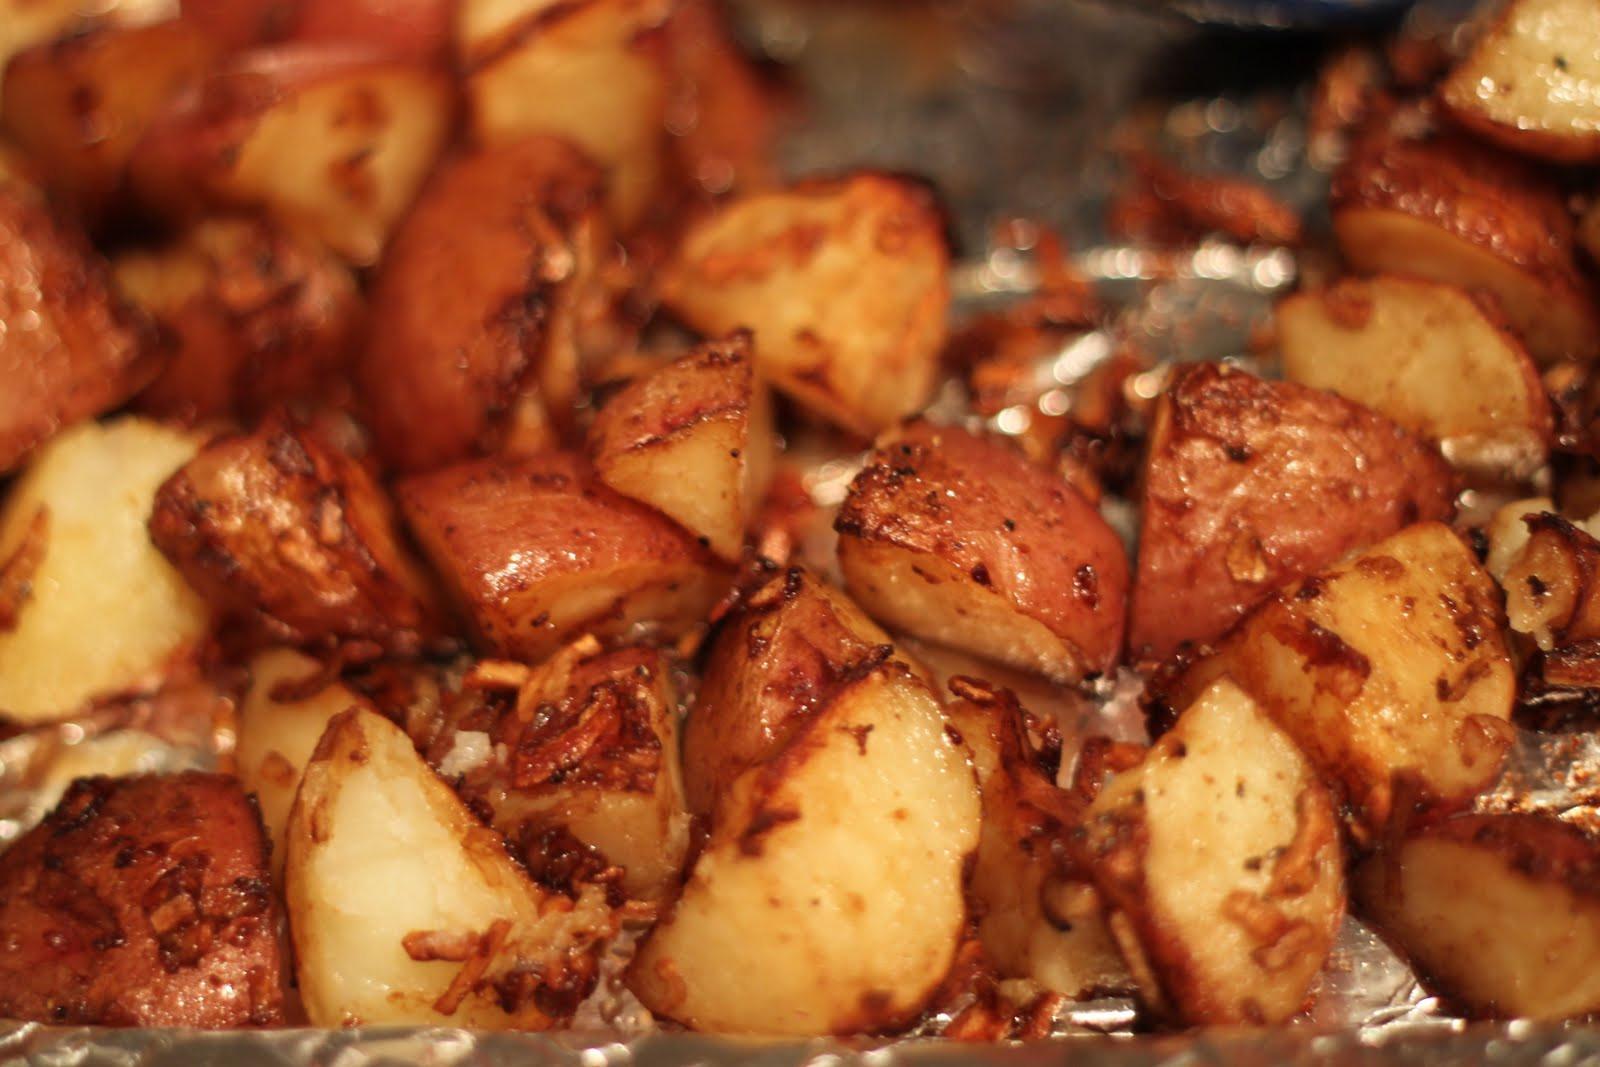 Lipton Onion Soup Potatoes  ion Roasted Potatoes